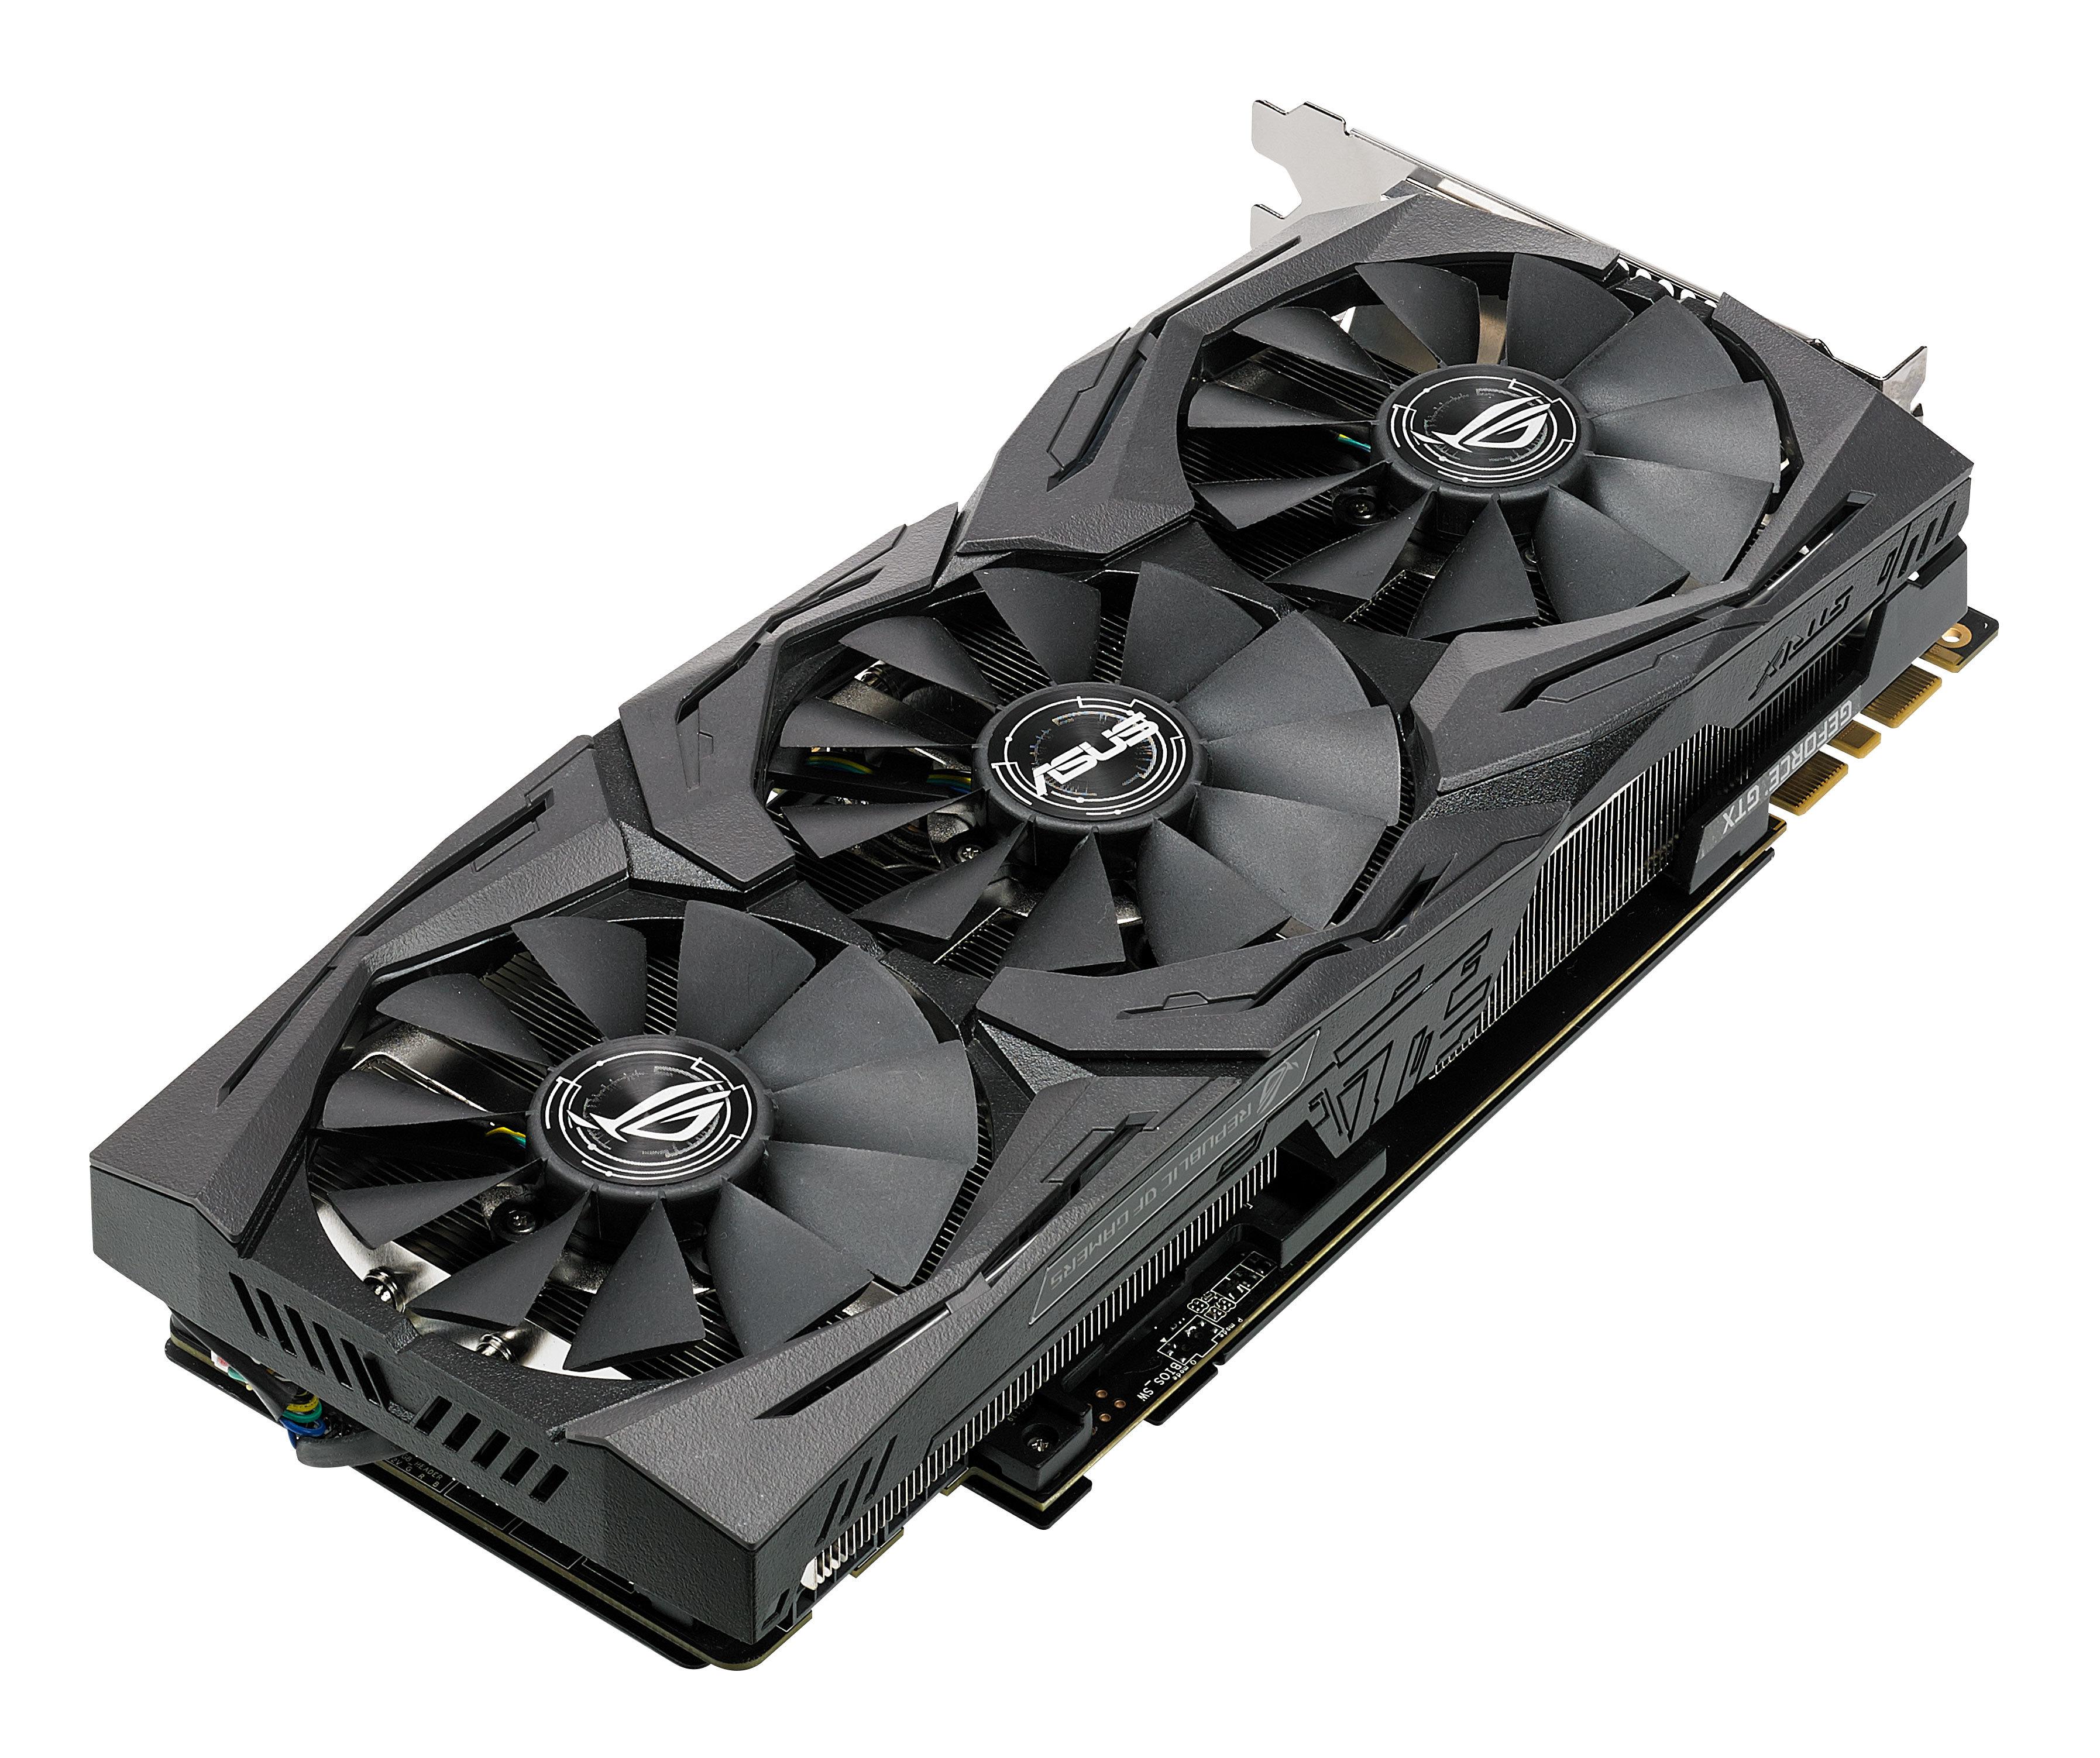 GeForce GTX 1080 Ti PCI Express 3.0 11 Go GDDR5X